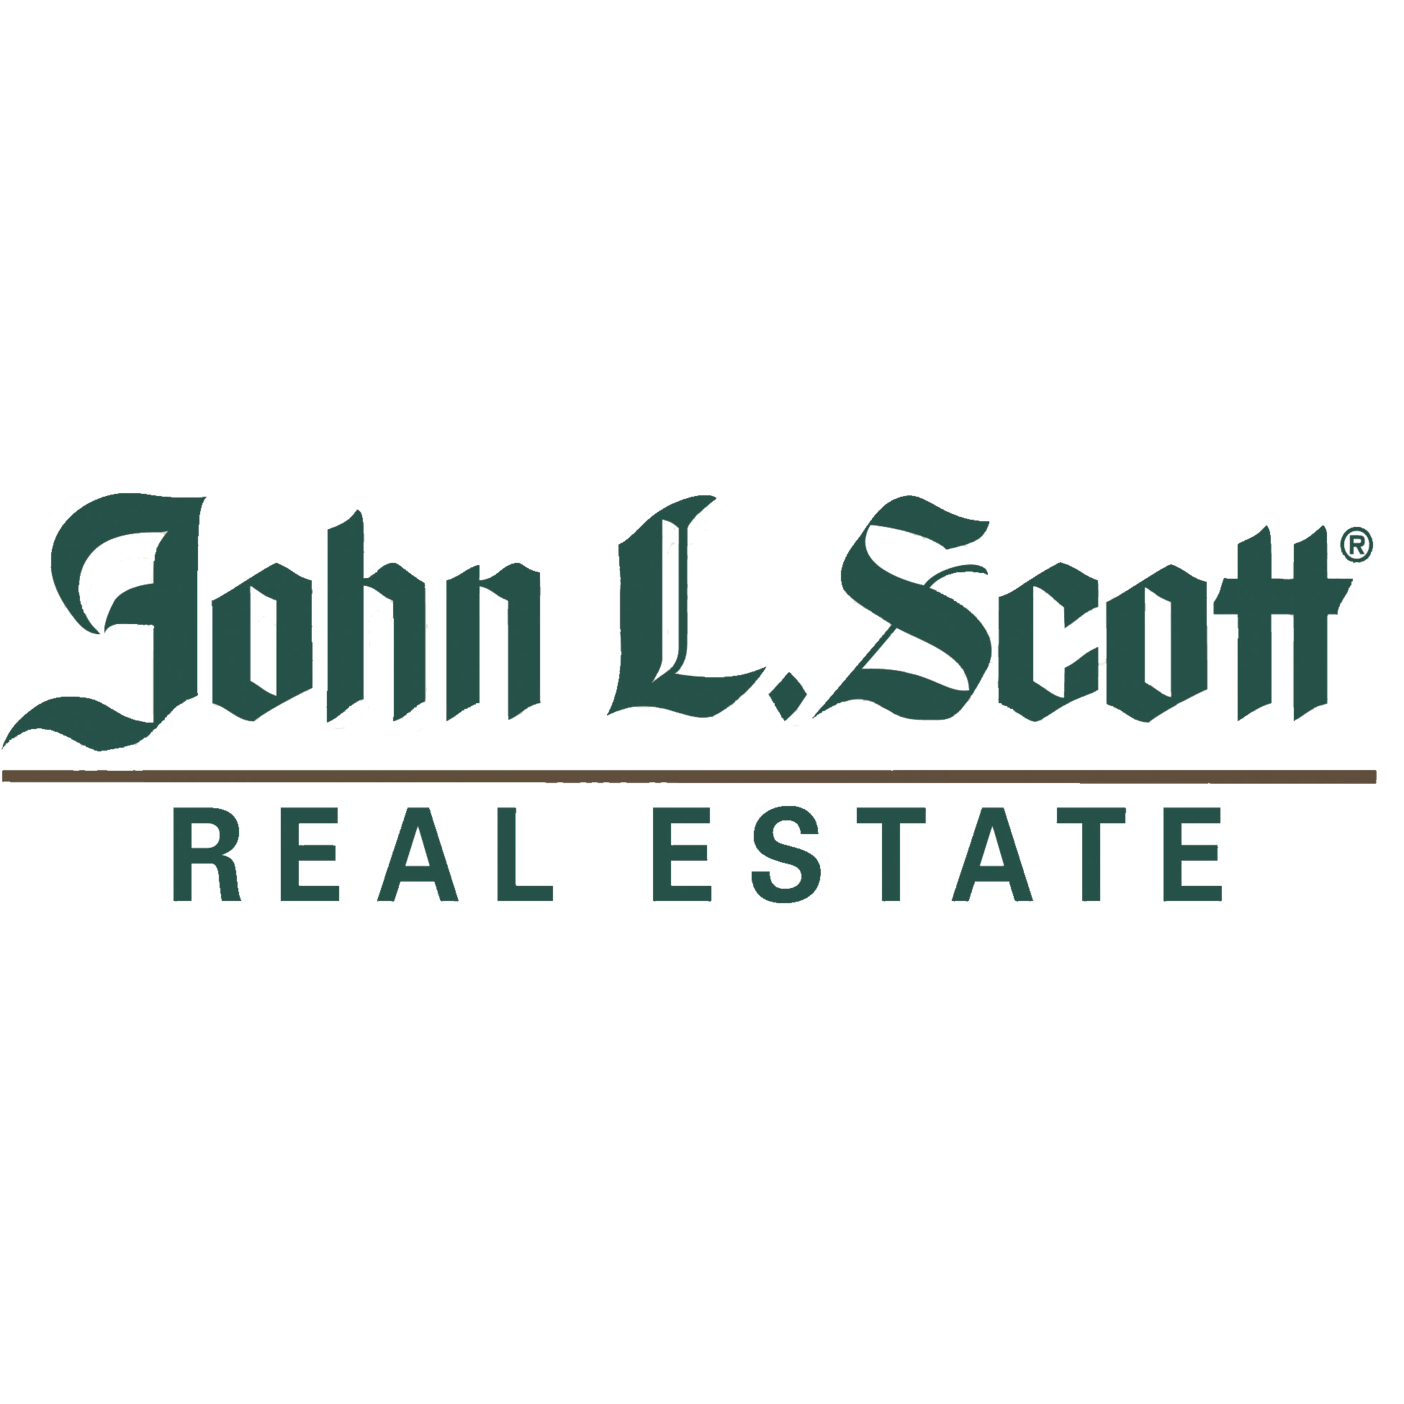 Yolanda Sabagala | John L. Scott Real Estate